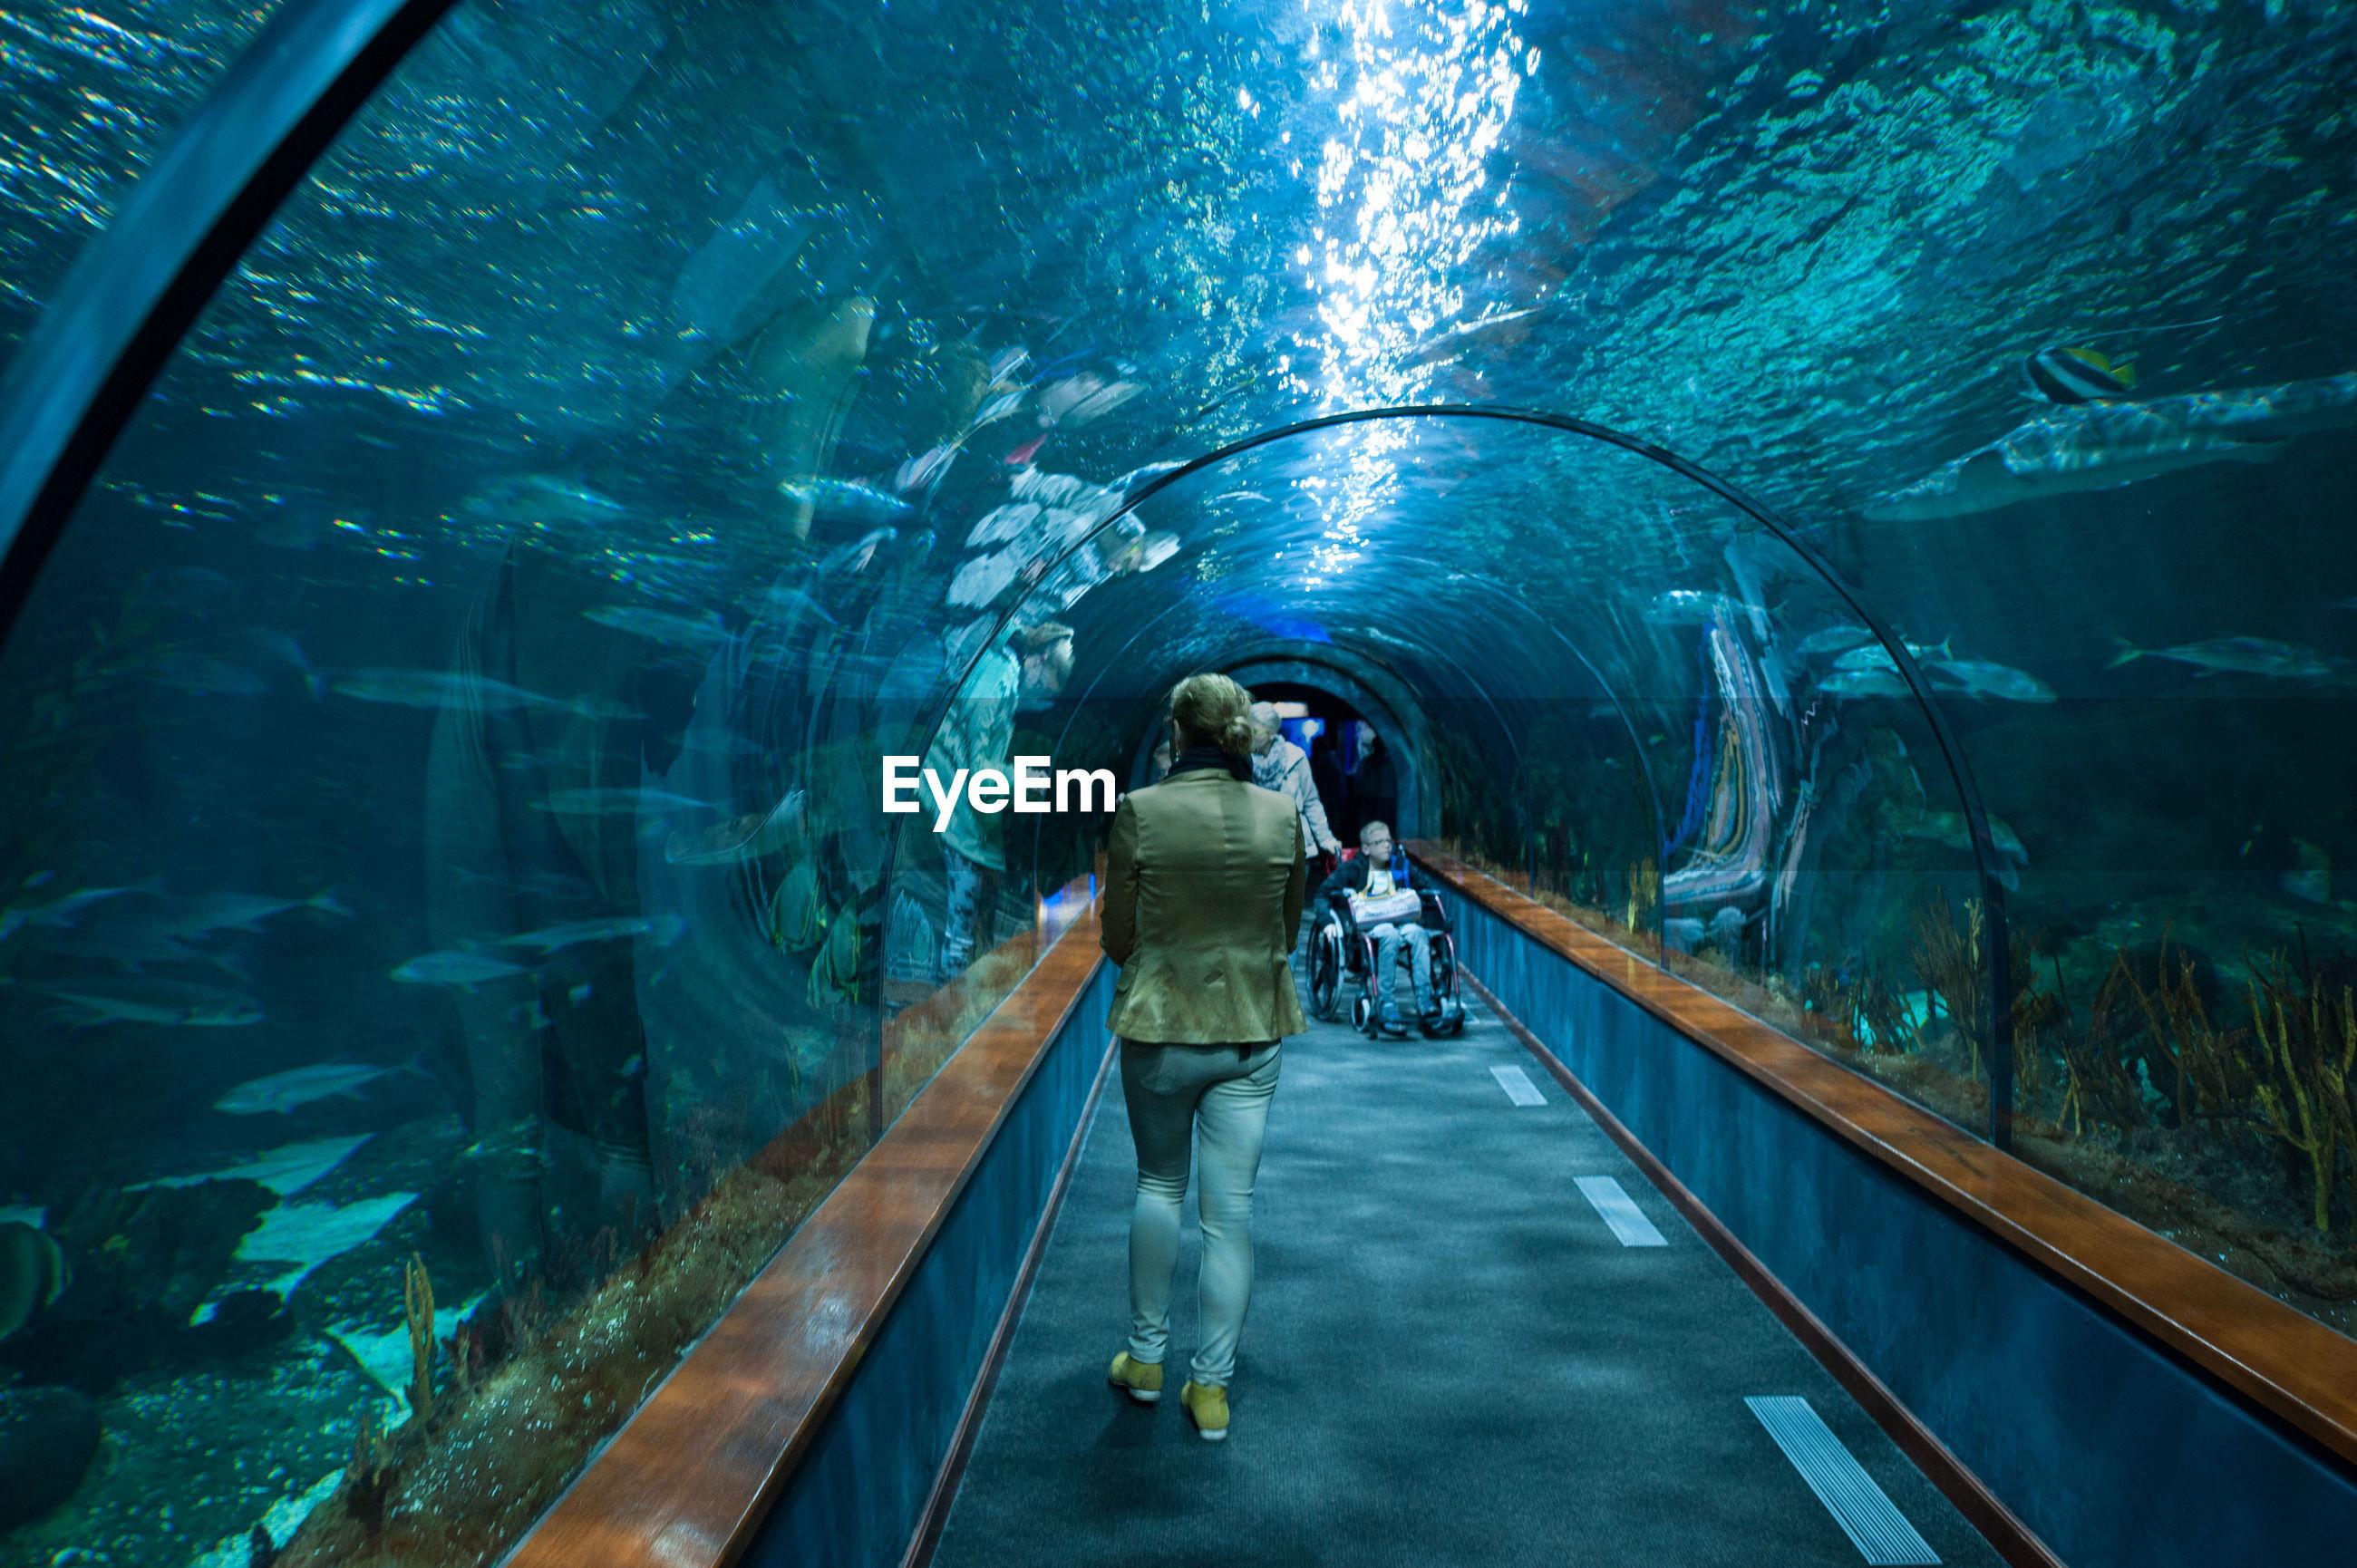 Rear view full length of woman walking in tunnel aquarium